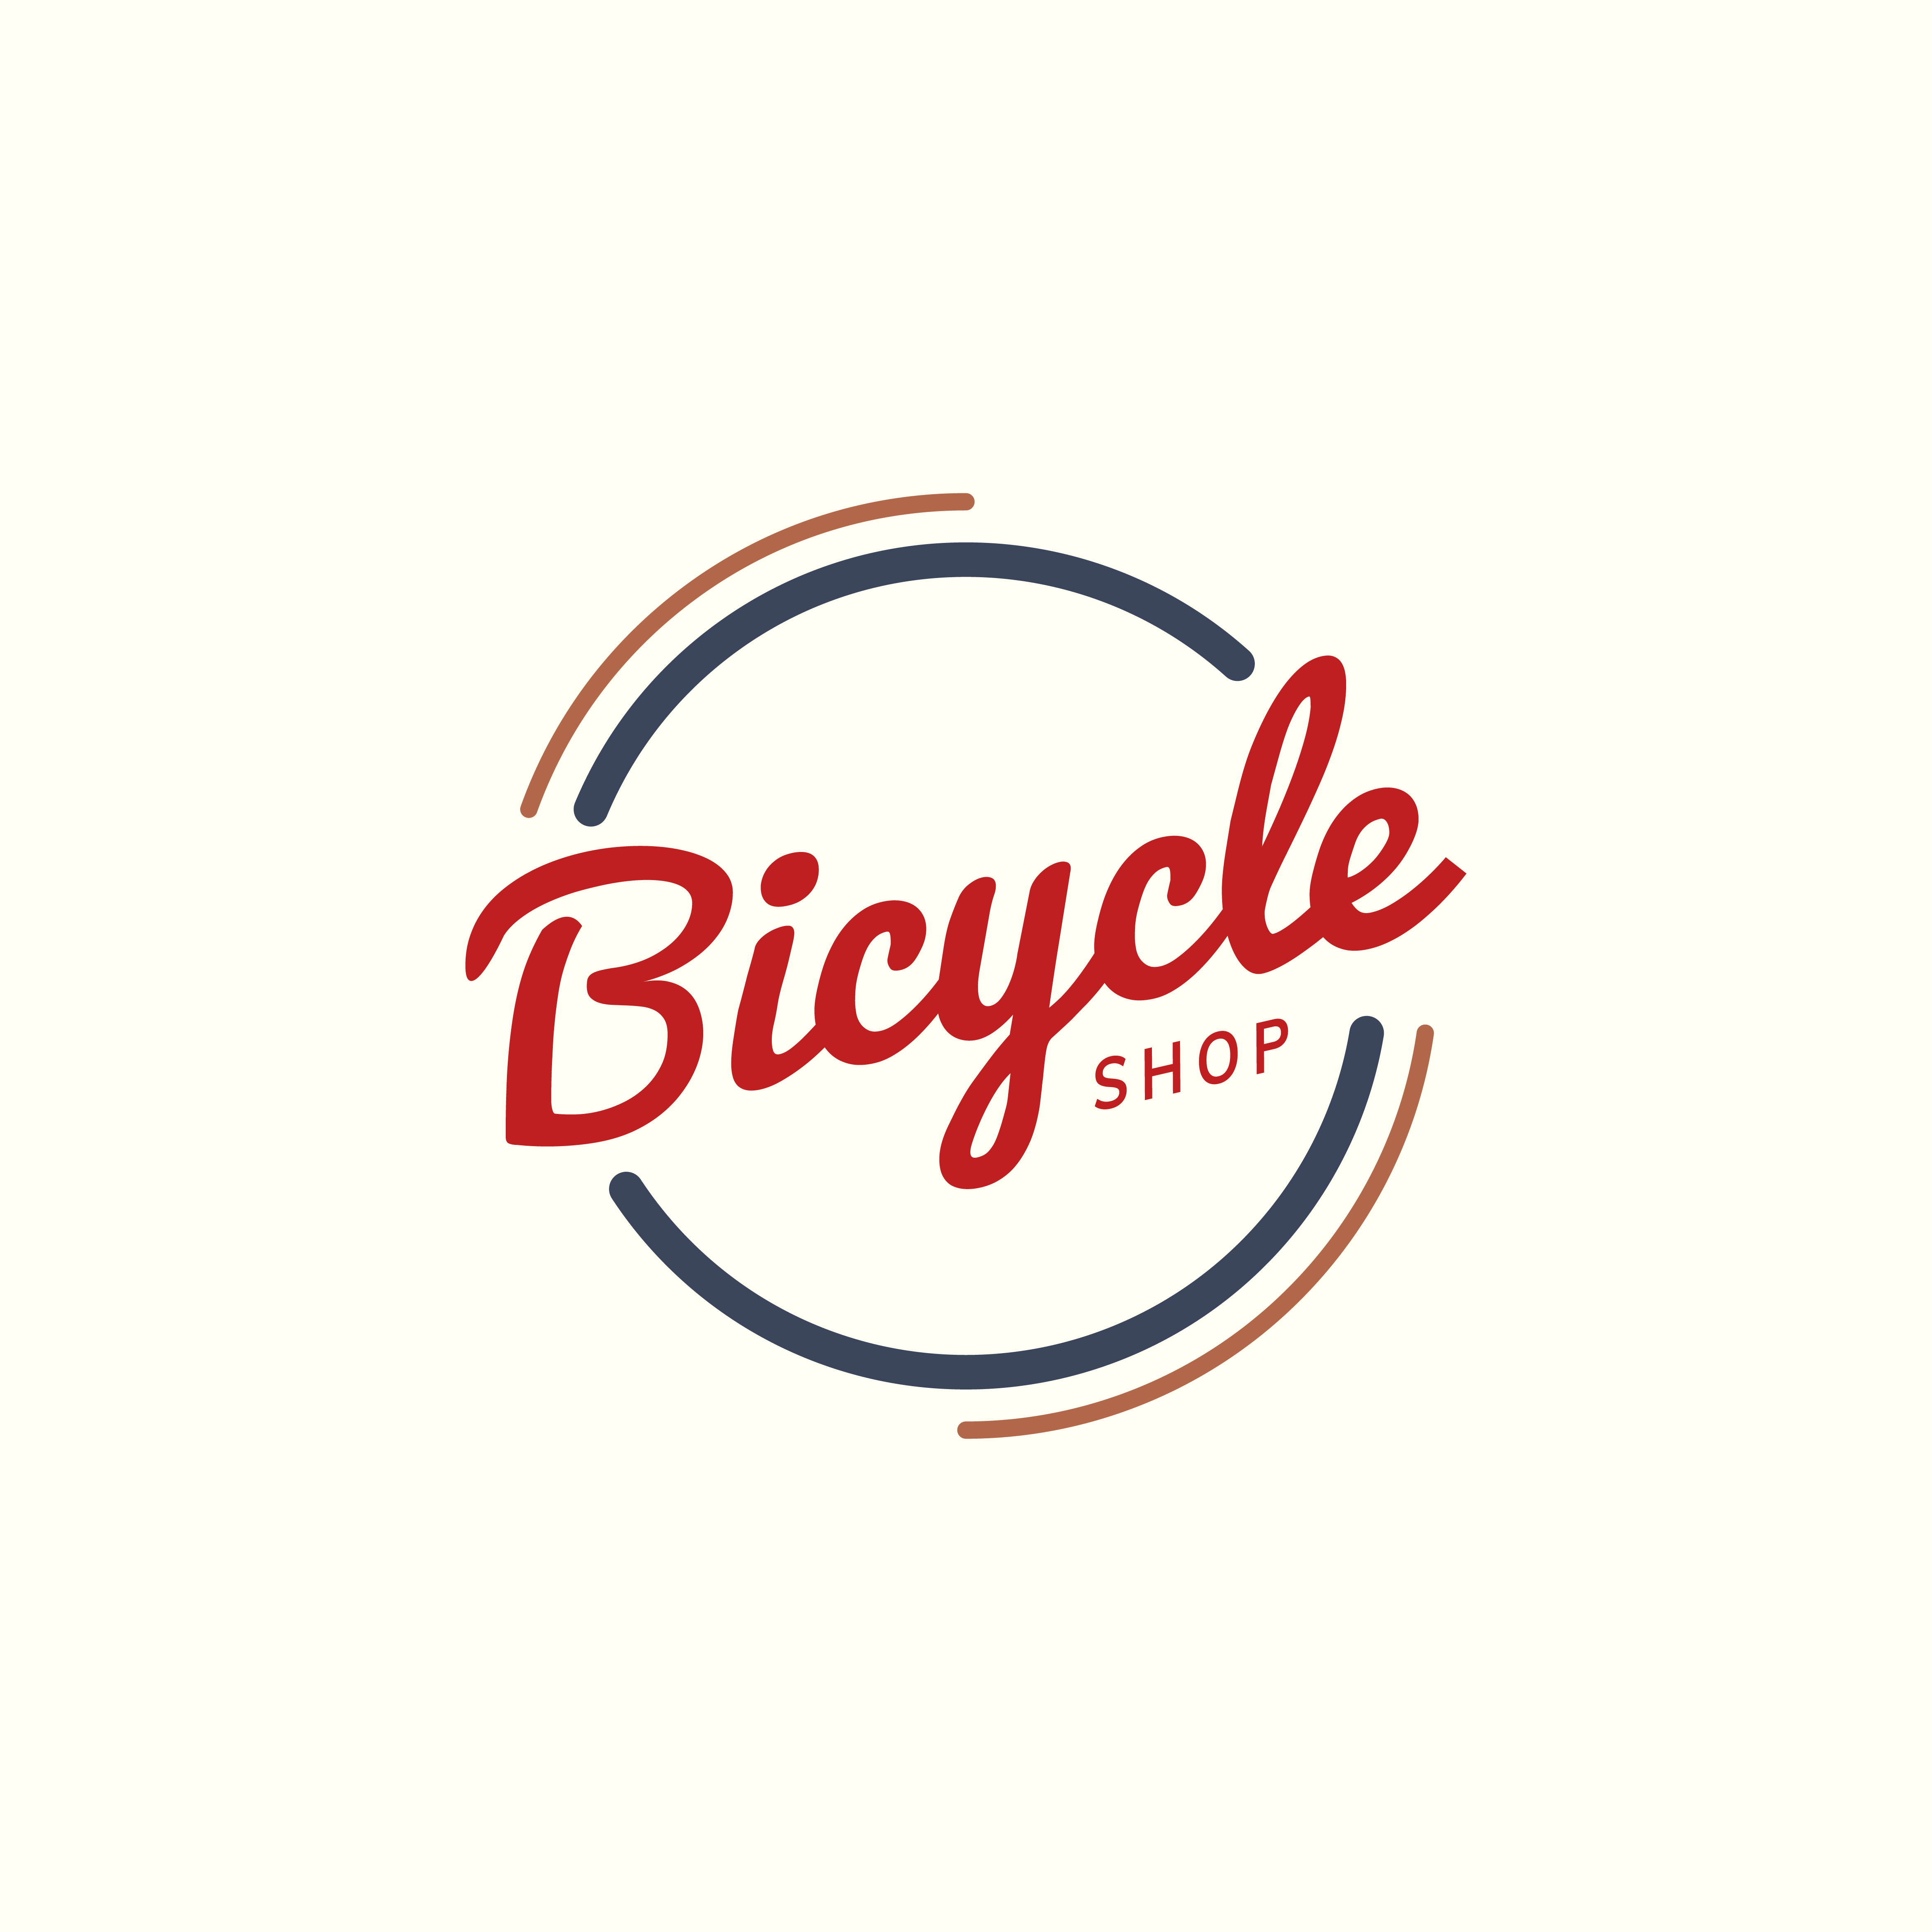 Bicycle Shop Logo Design Vector